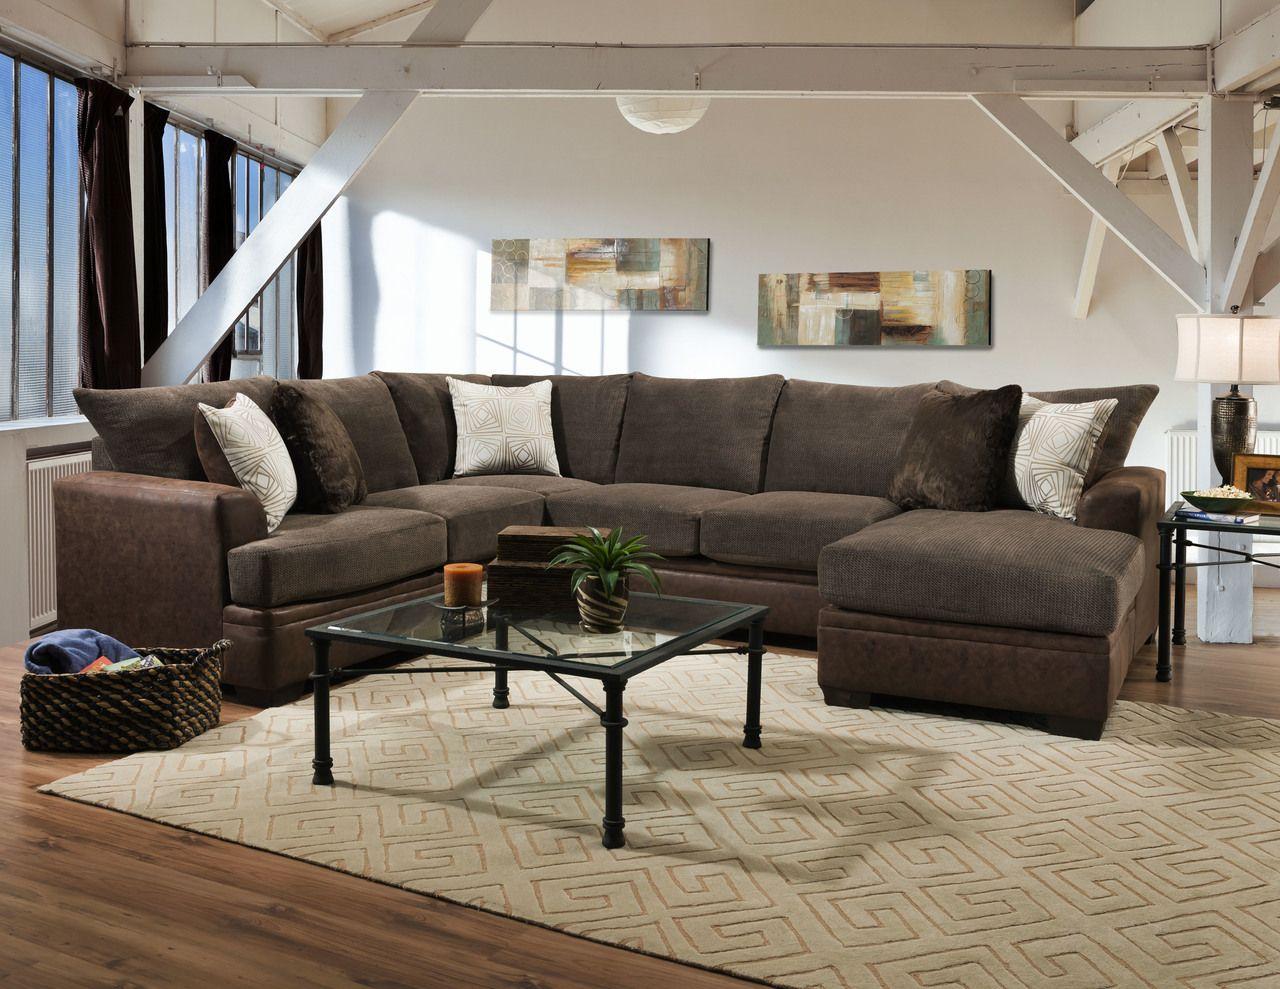 American Furniture Akan Mocha XL Sectional Sofa  Furniture